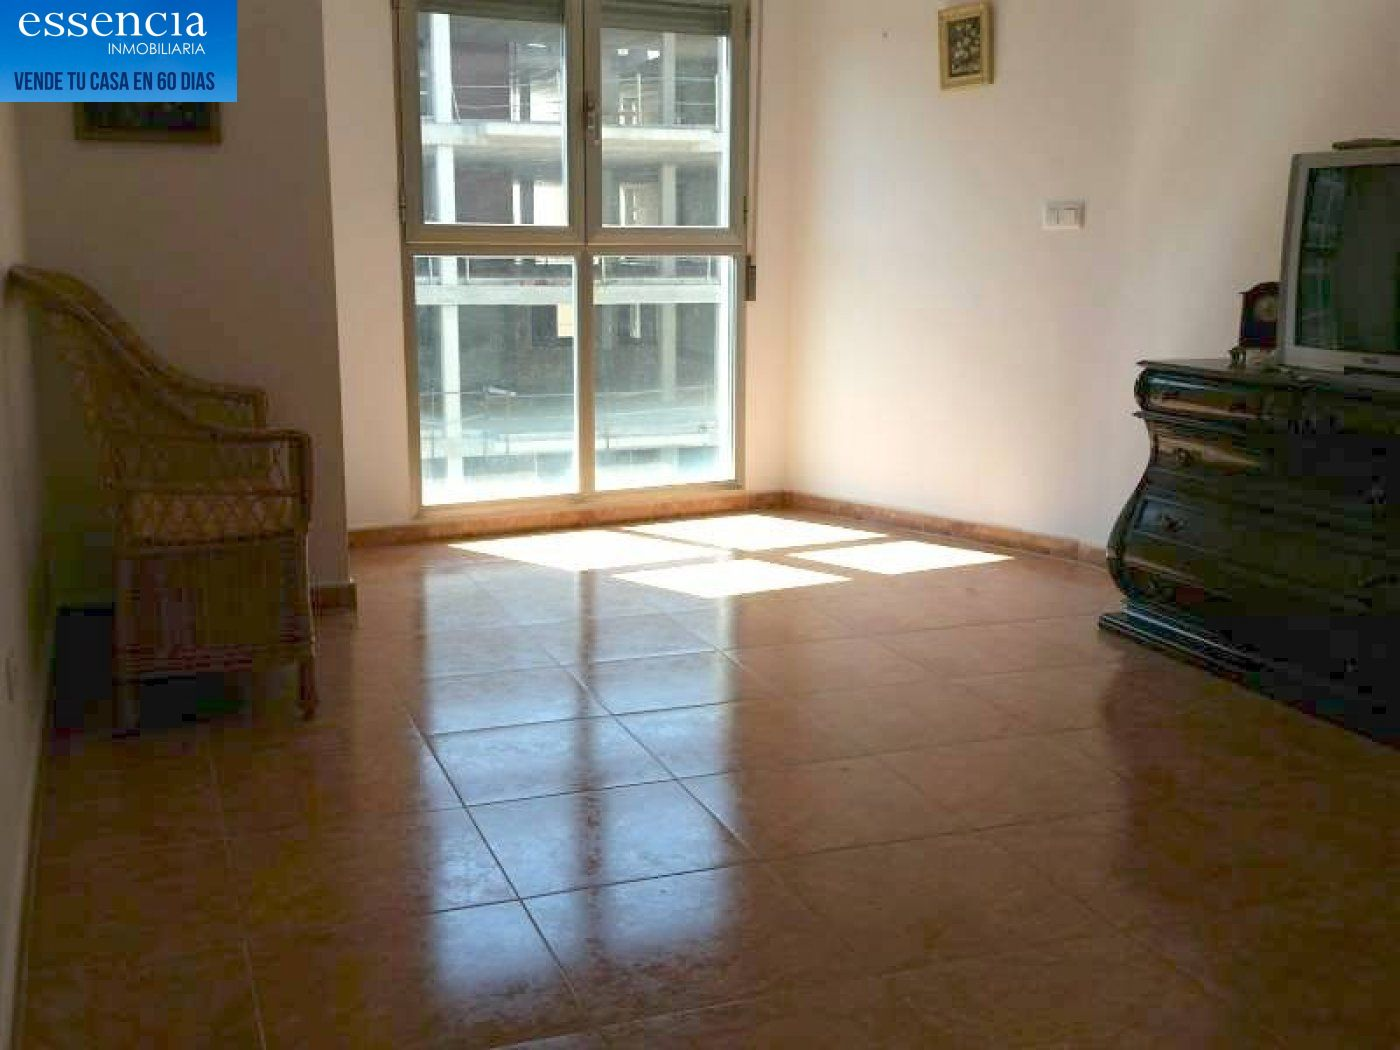 Oferta sin visitar. piso en oliva con ascensor, calle isaac albeniz - imagenInmueble15